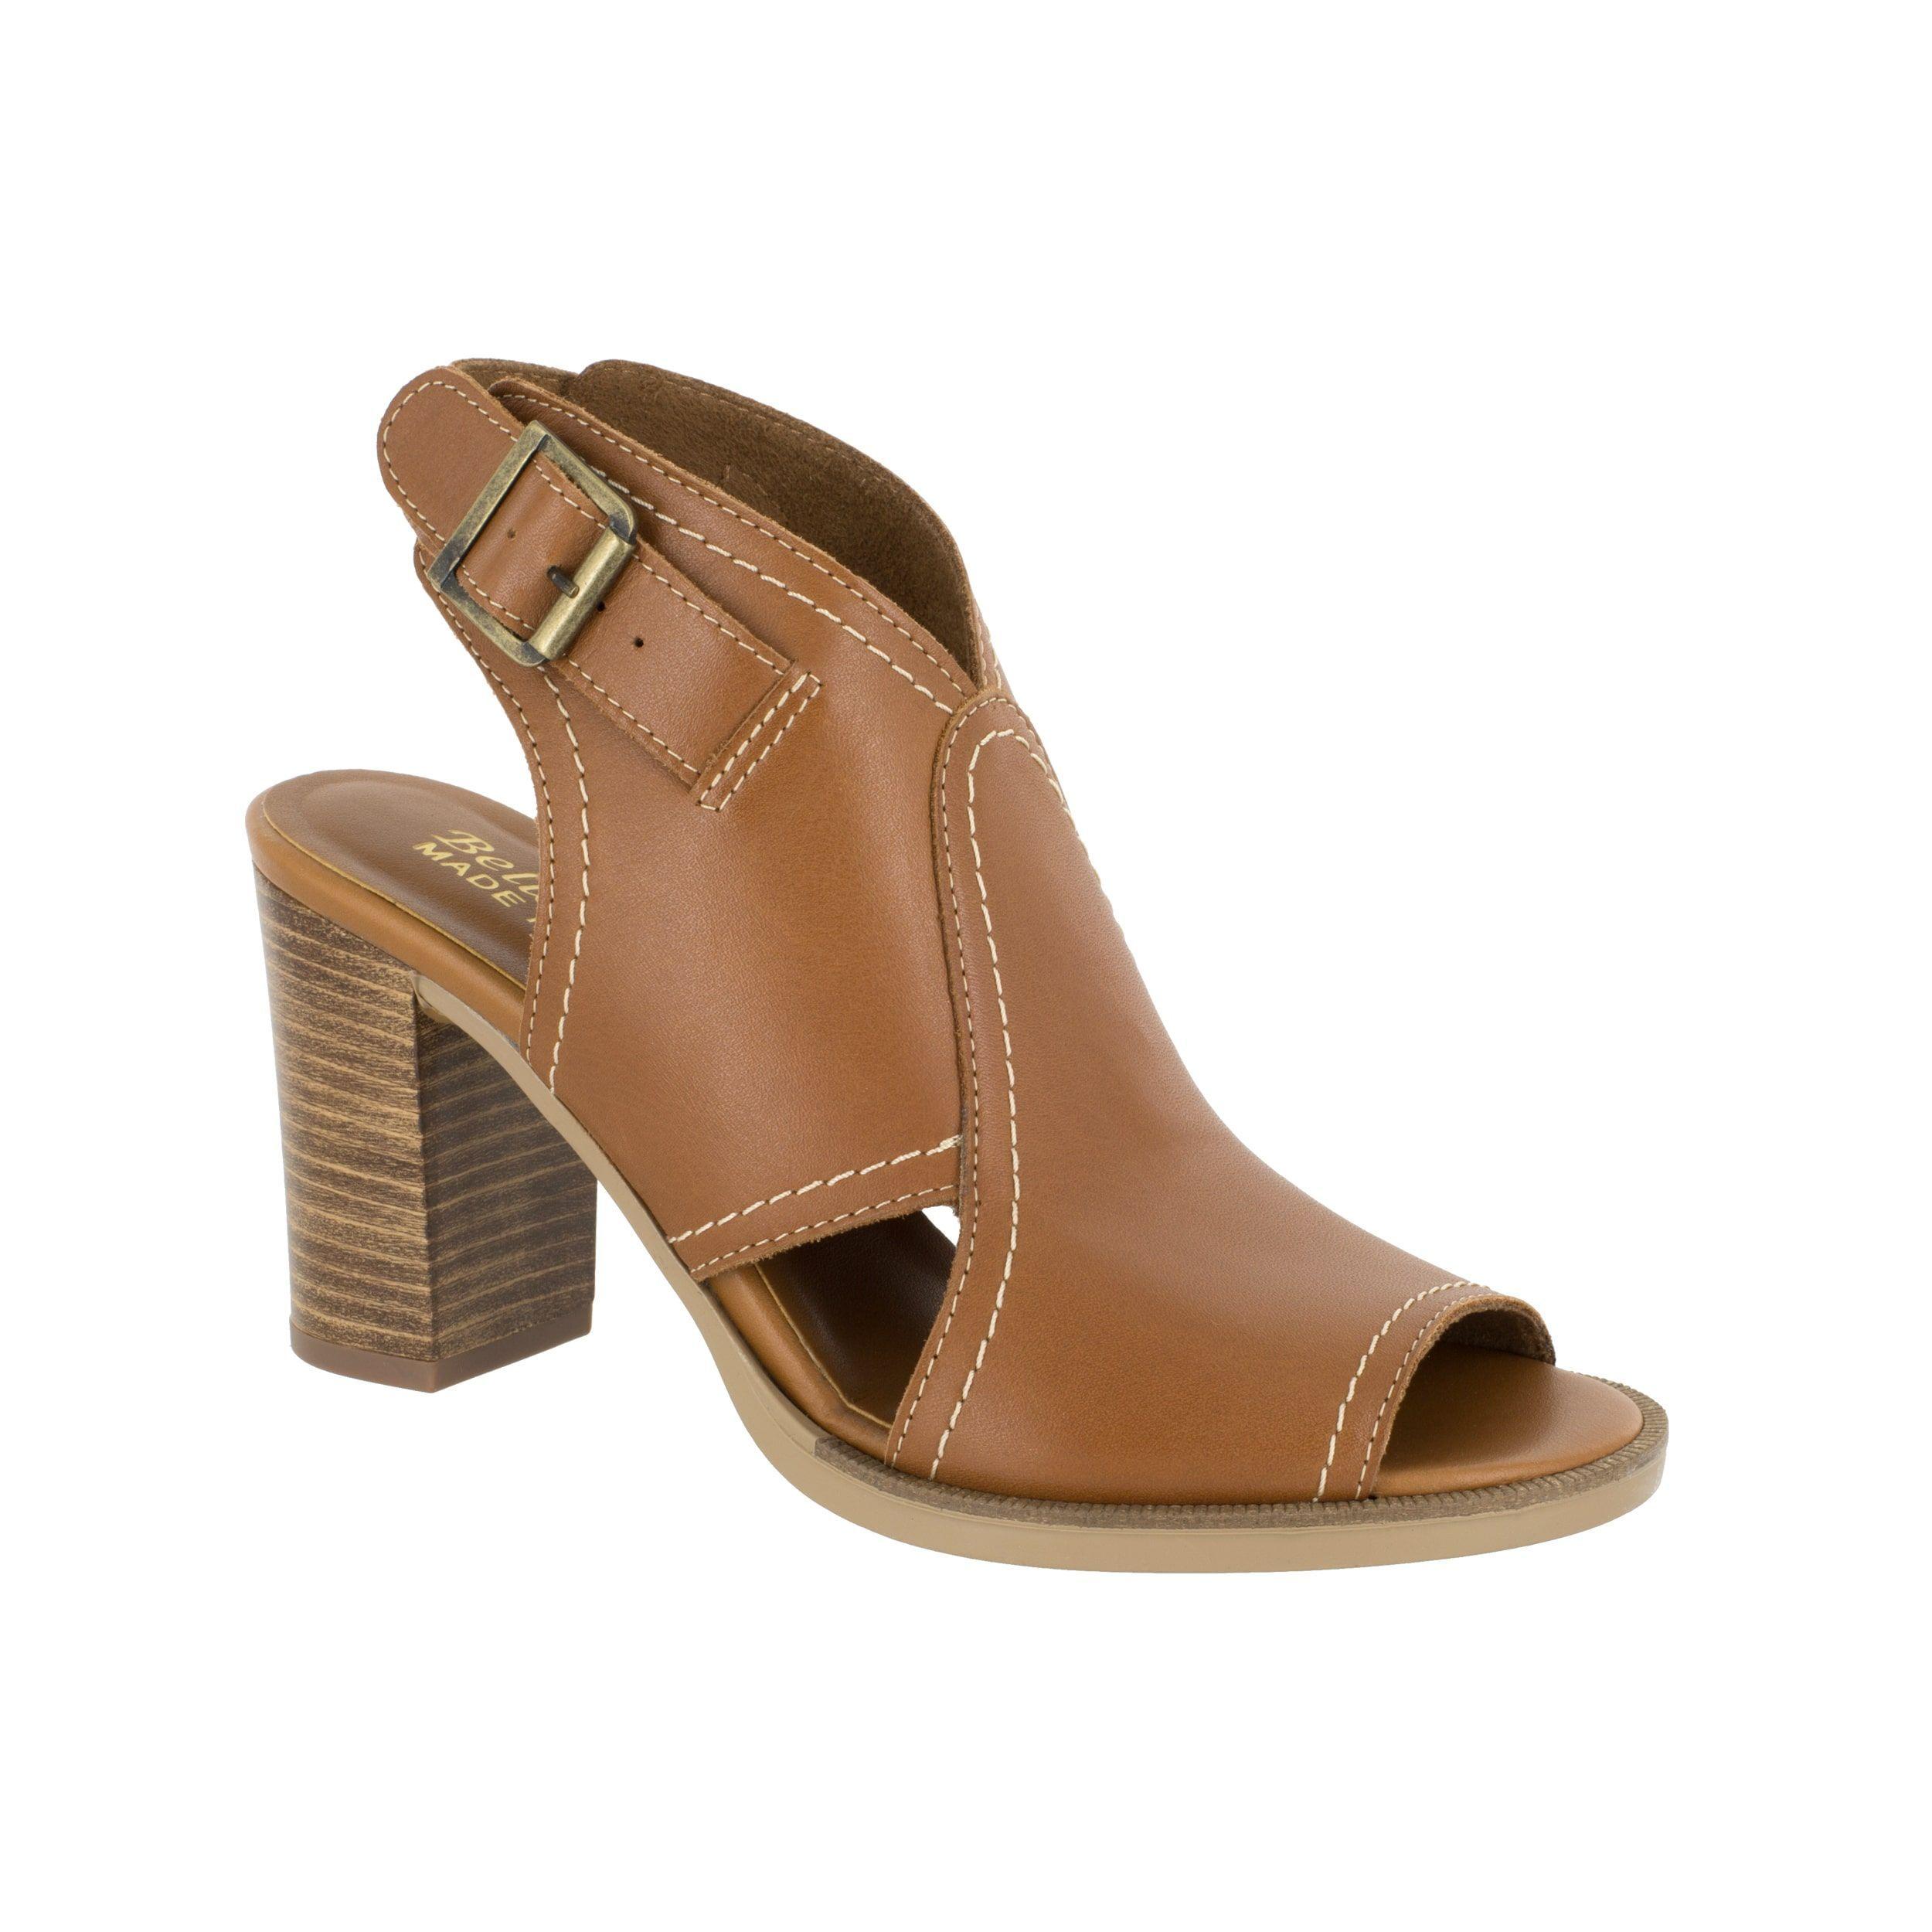 18914ebf2b0 Bella Vita Women s Viv-Italy Whiskey Italian Leather Open-toe Stacked Heel  Sandals